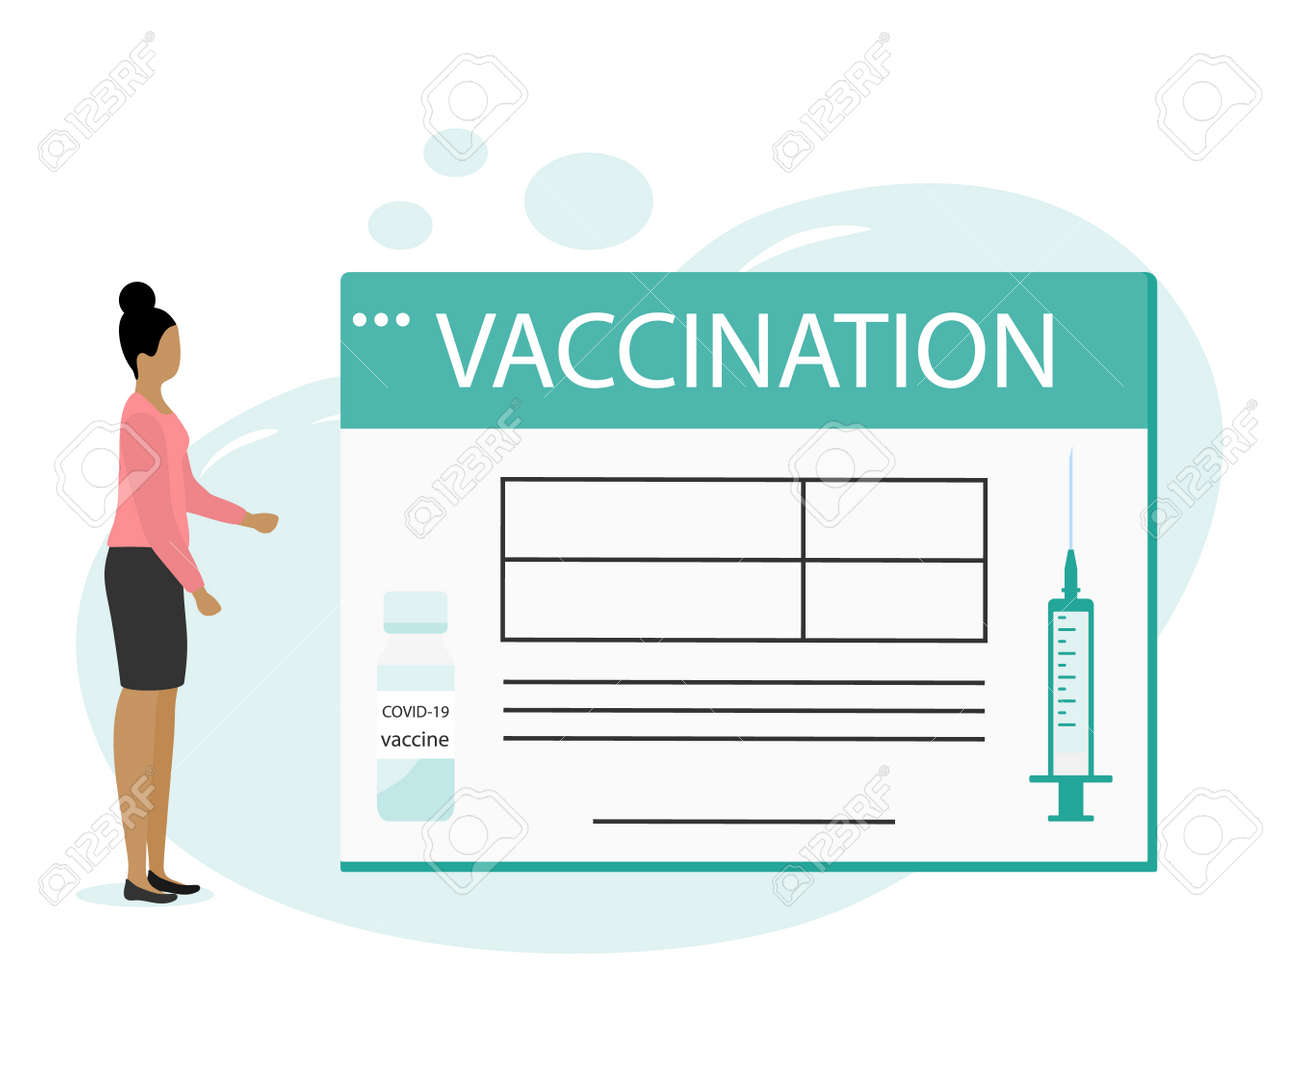 Vector illustration People Syringe Vaccine coronavirus Immunization Adult Vaccination calendar Vaccination information Healthcare Public health program Medical support service Design for web app print - 169848248